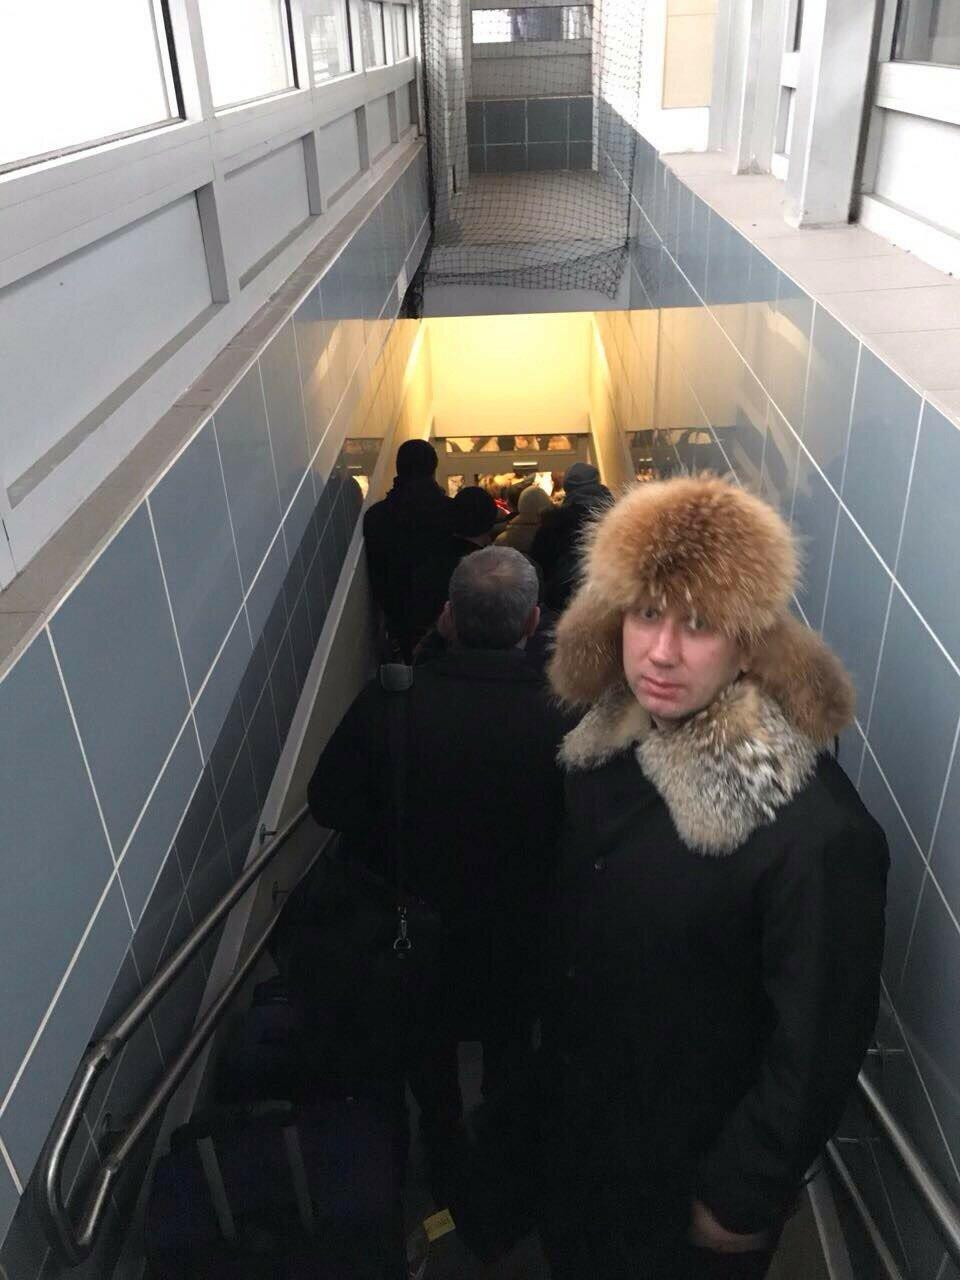 Сапсан Минск-Вильнюс, 12 декабря 2016